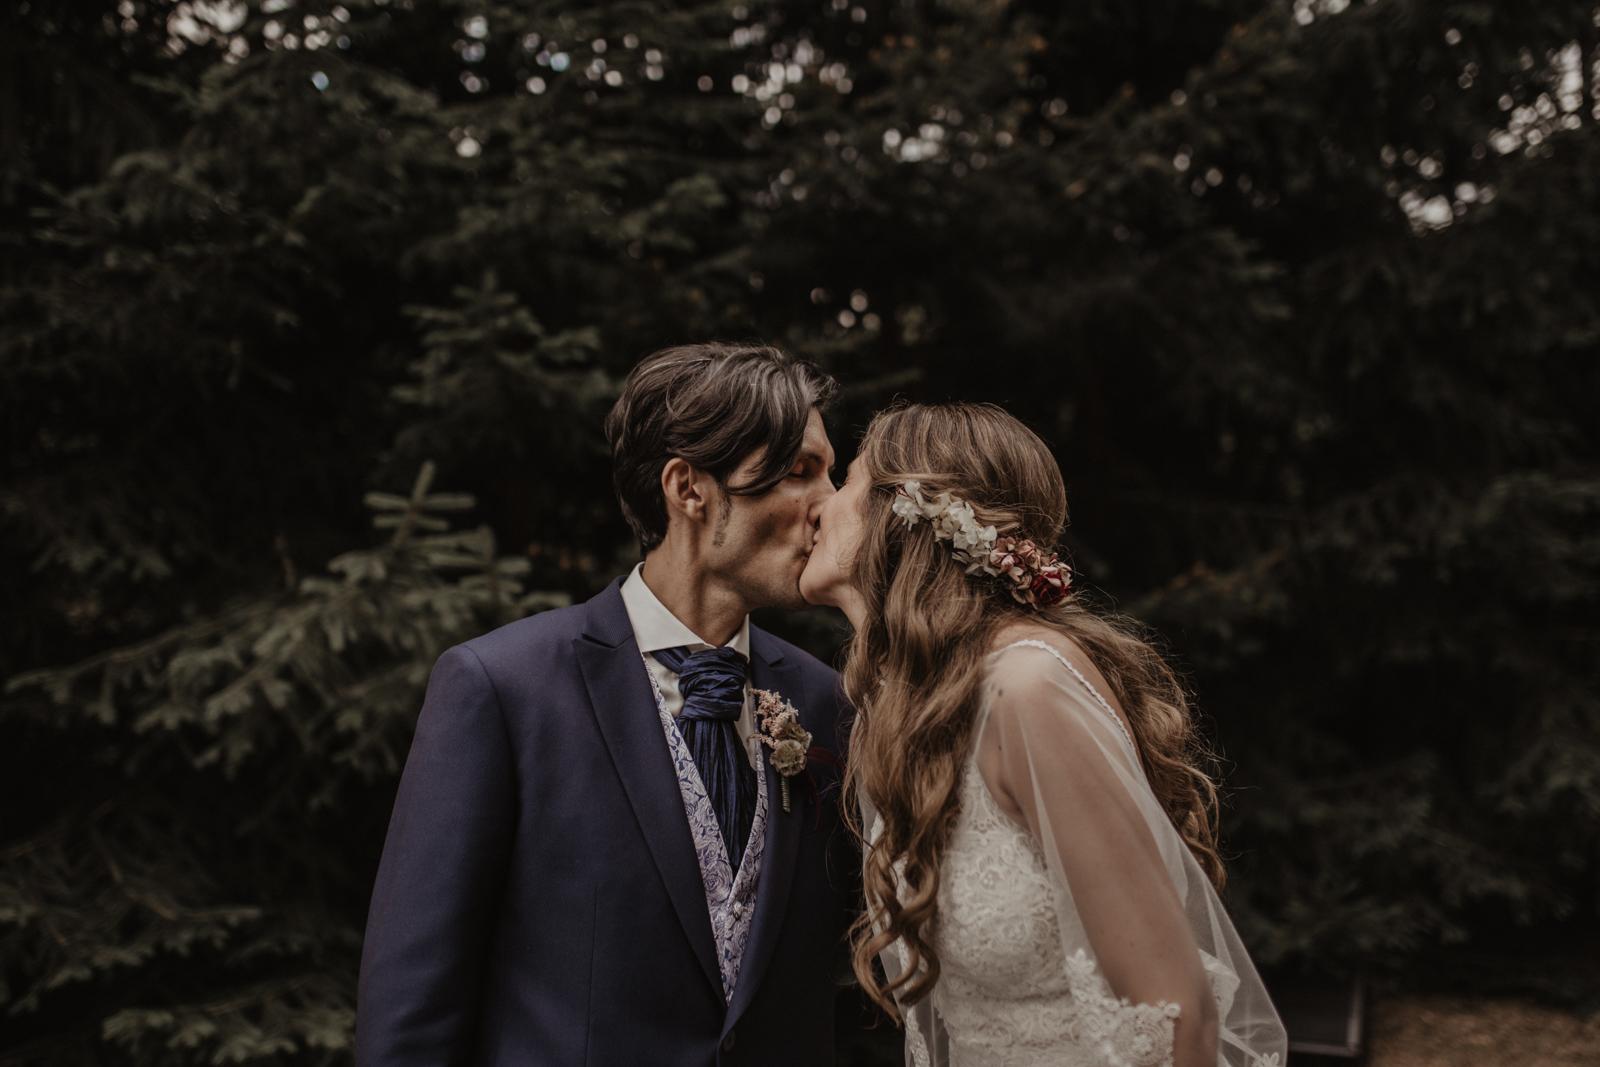 thenortherngirlphotography_photography_thenortherngirl_rebeccascabros_wedding_weddingphotography_weddingphotographer_barcelona_bodaenbarcelona_bodaenmaselmarti_bodarogeryvane-420.jpg